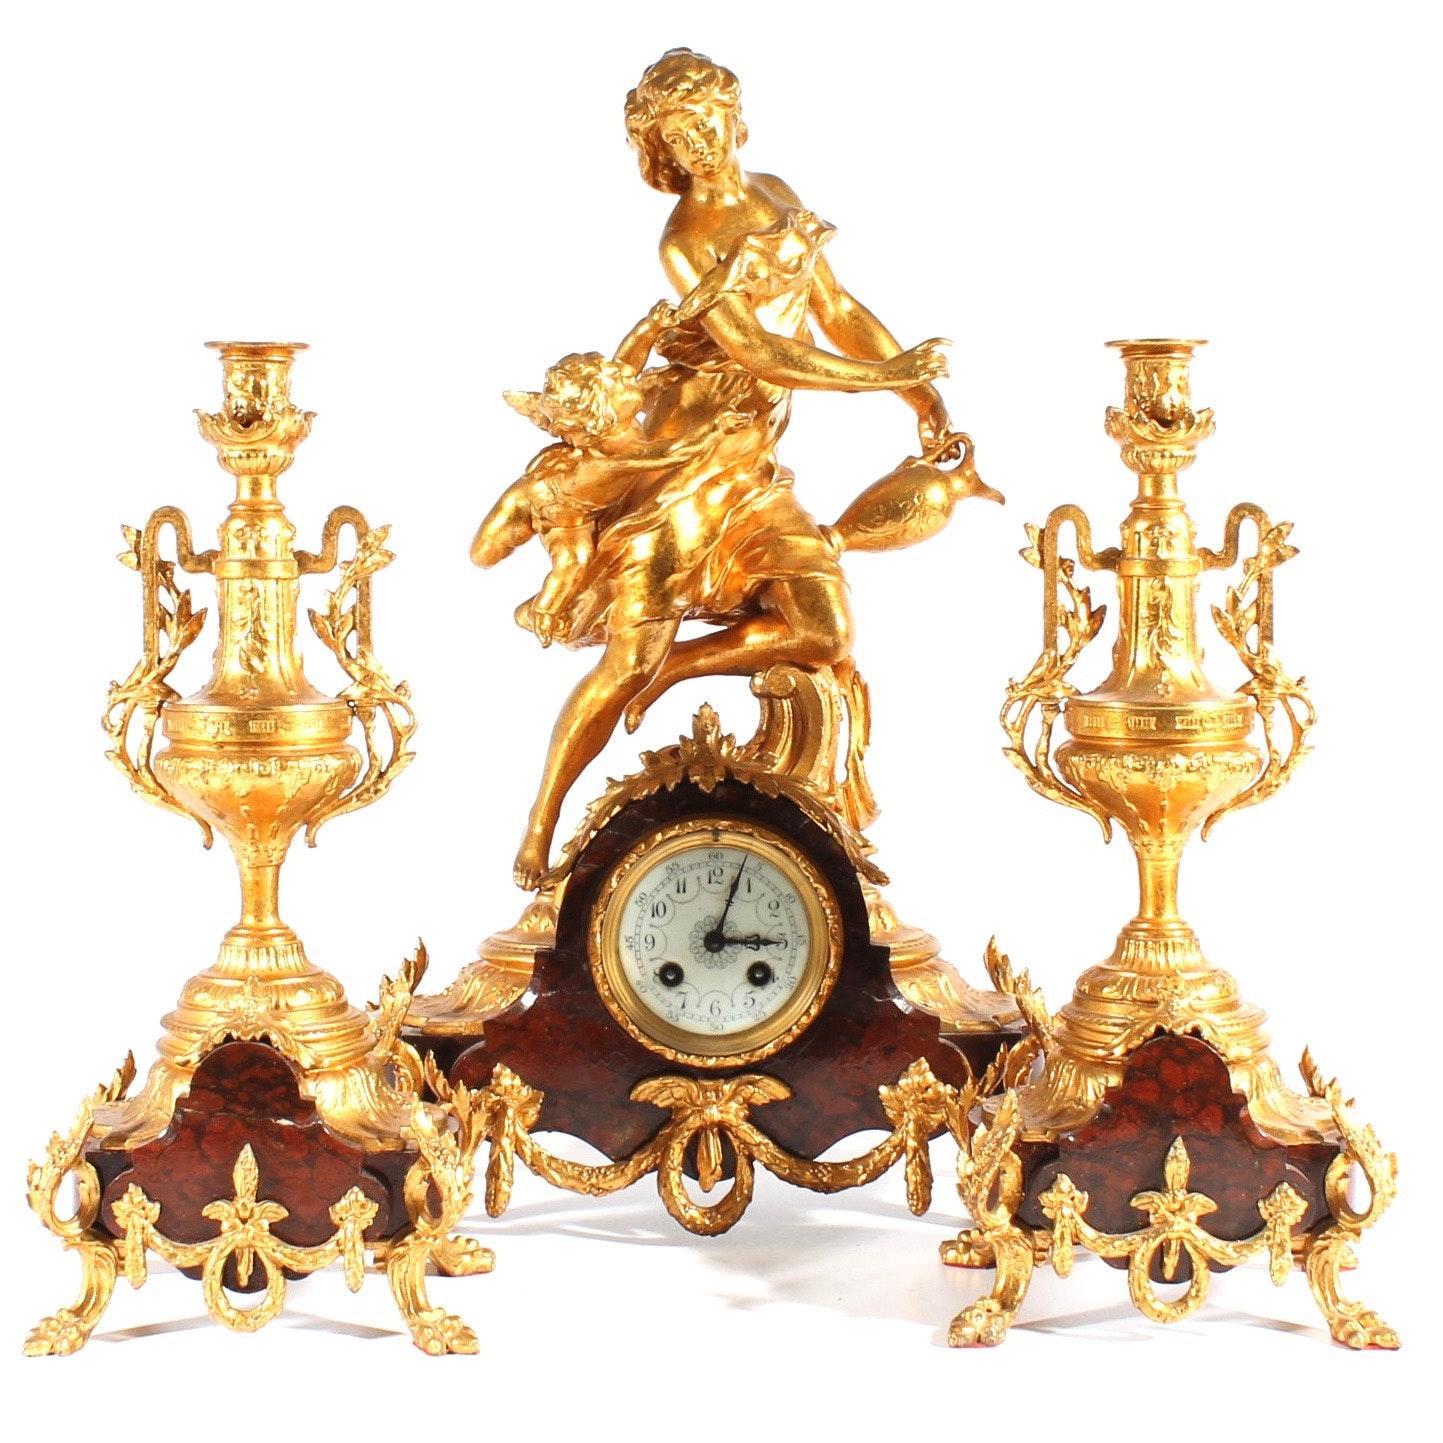 Antique 19th Century Marti Et Cie Mantle Clock and Garniture